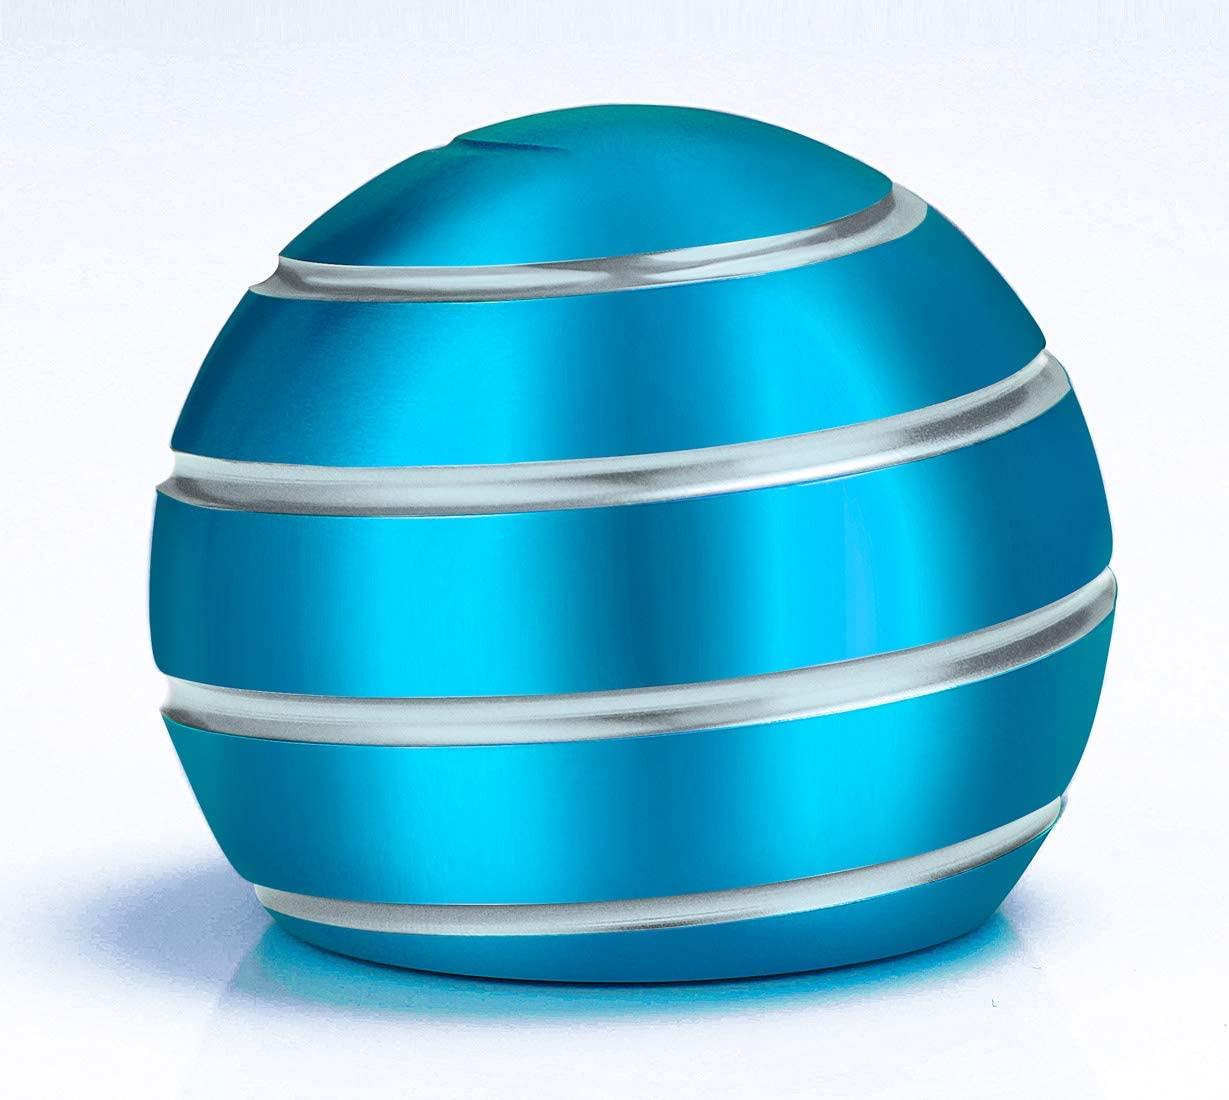 fidget-toy-gifts-visual-illusion-ball